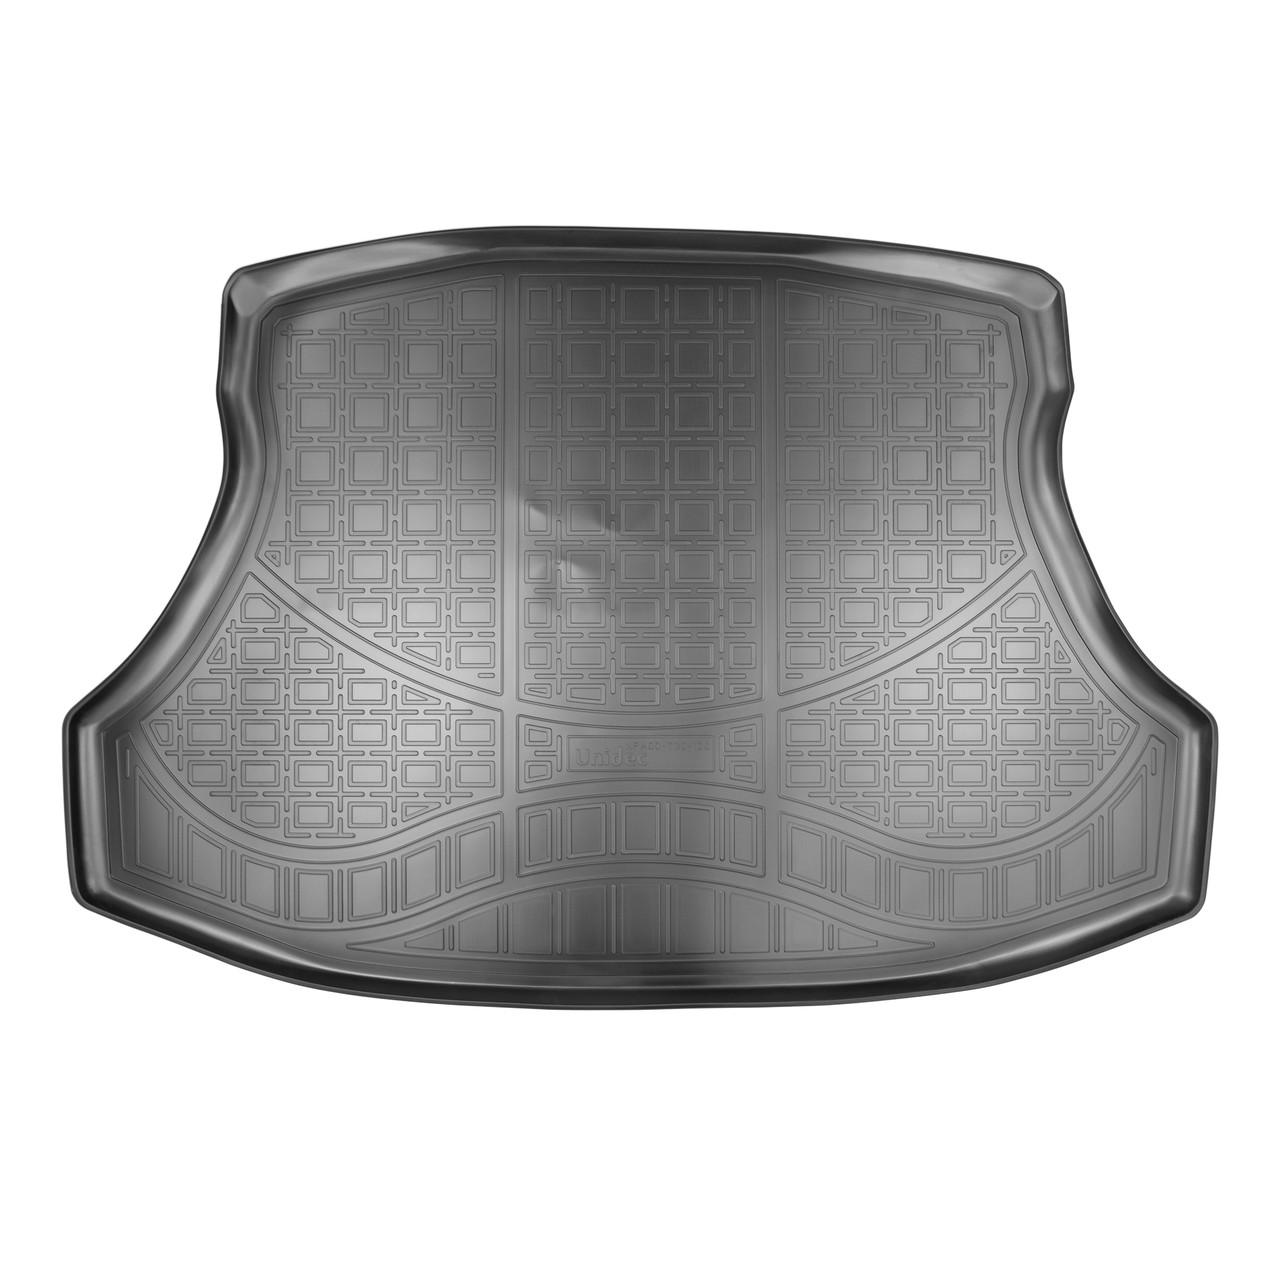 Коврик в багажник Honda Civic (2012-2015) седан (4 двери)